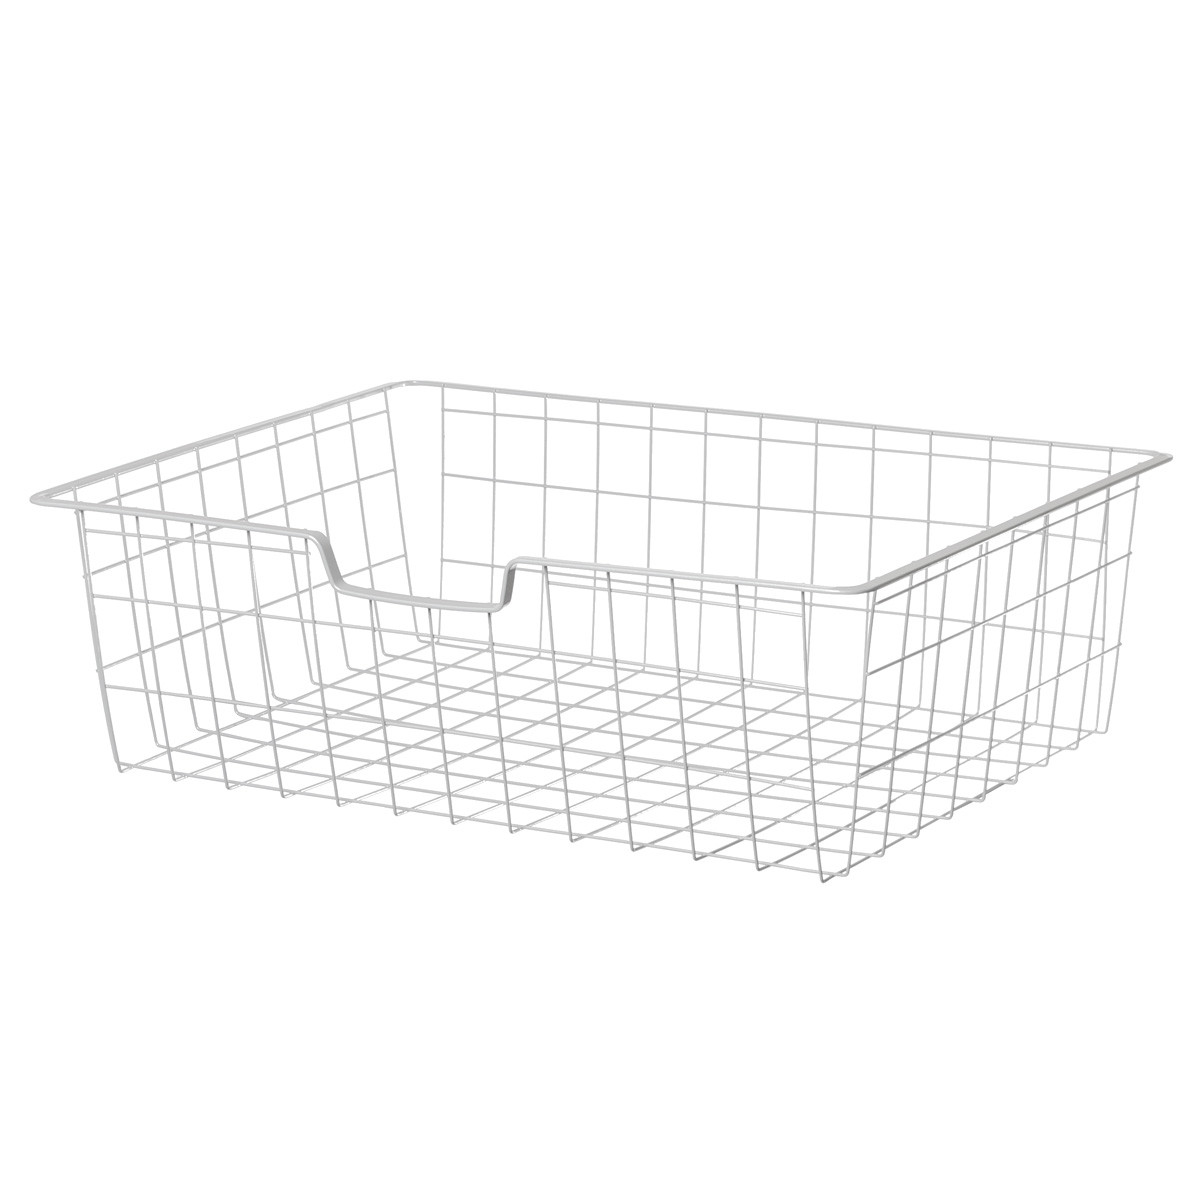 Корзина для гардеробной системы Larvij  белая 588×424×180мм L9540WH